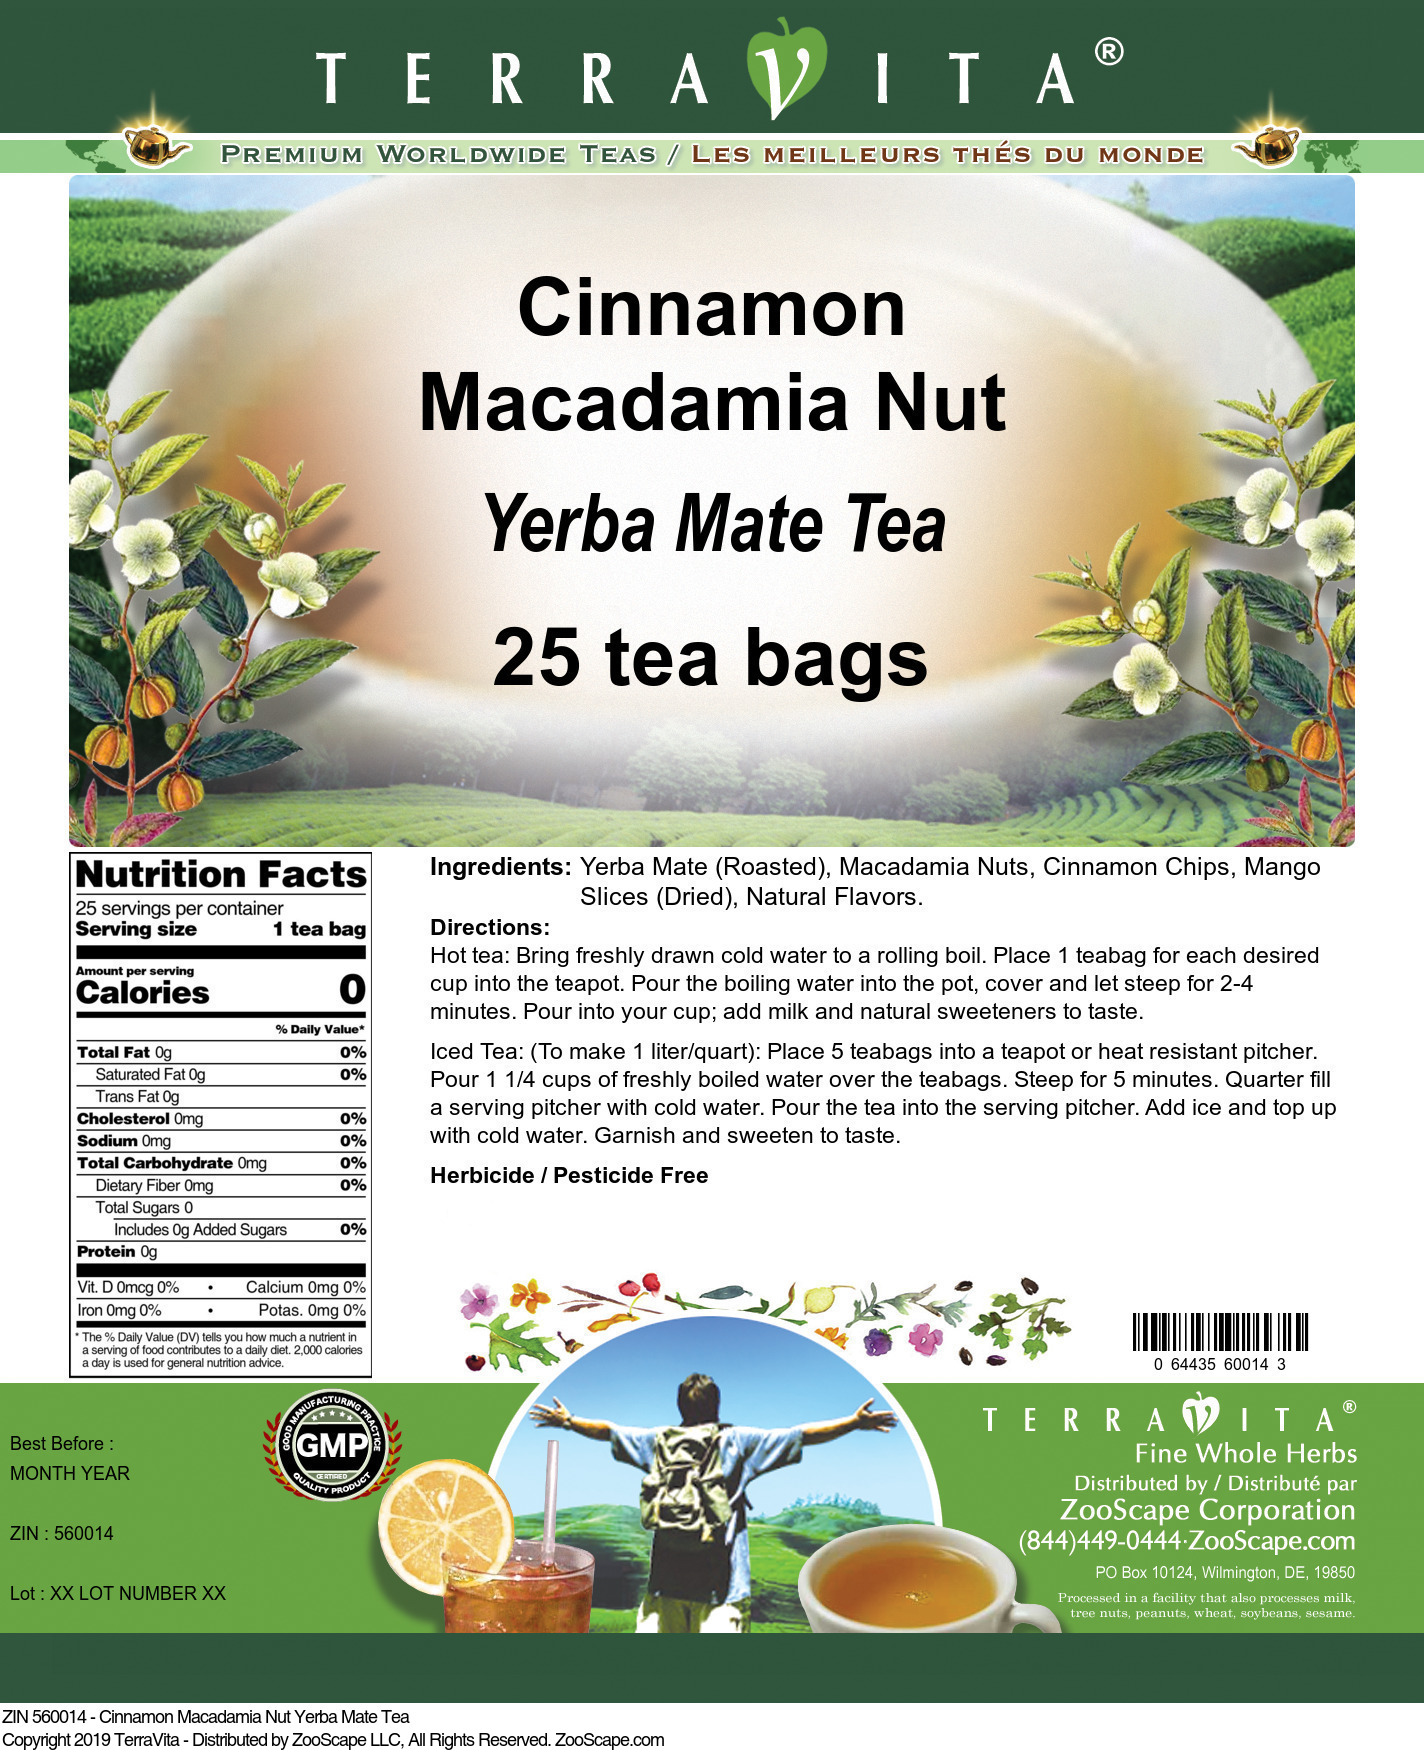 Cinnamon Macadamia Nut Yerba Mate